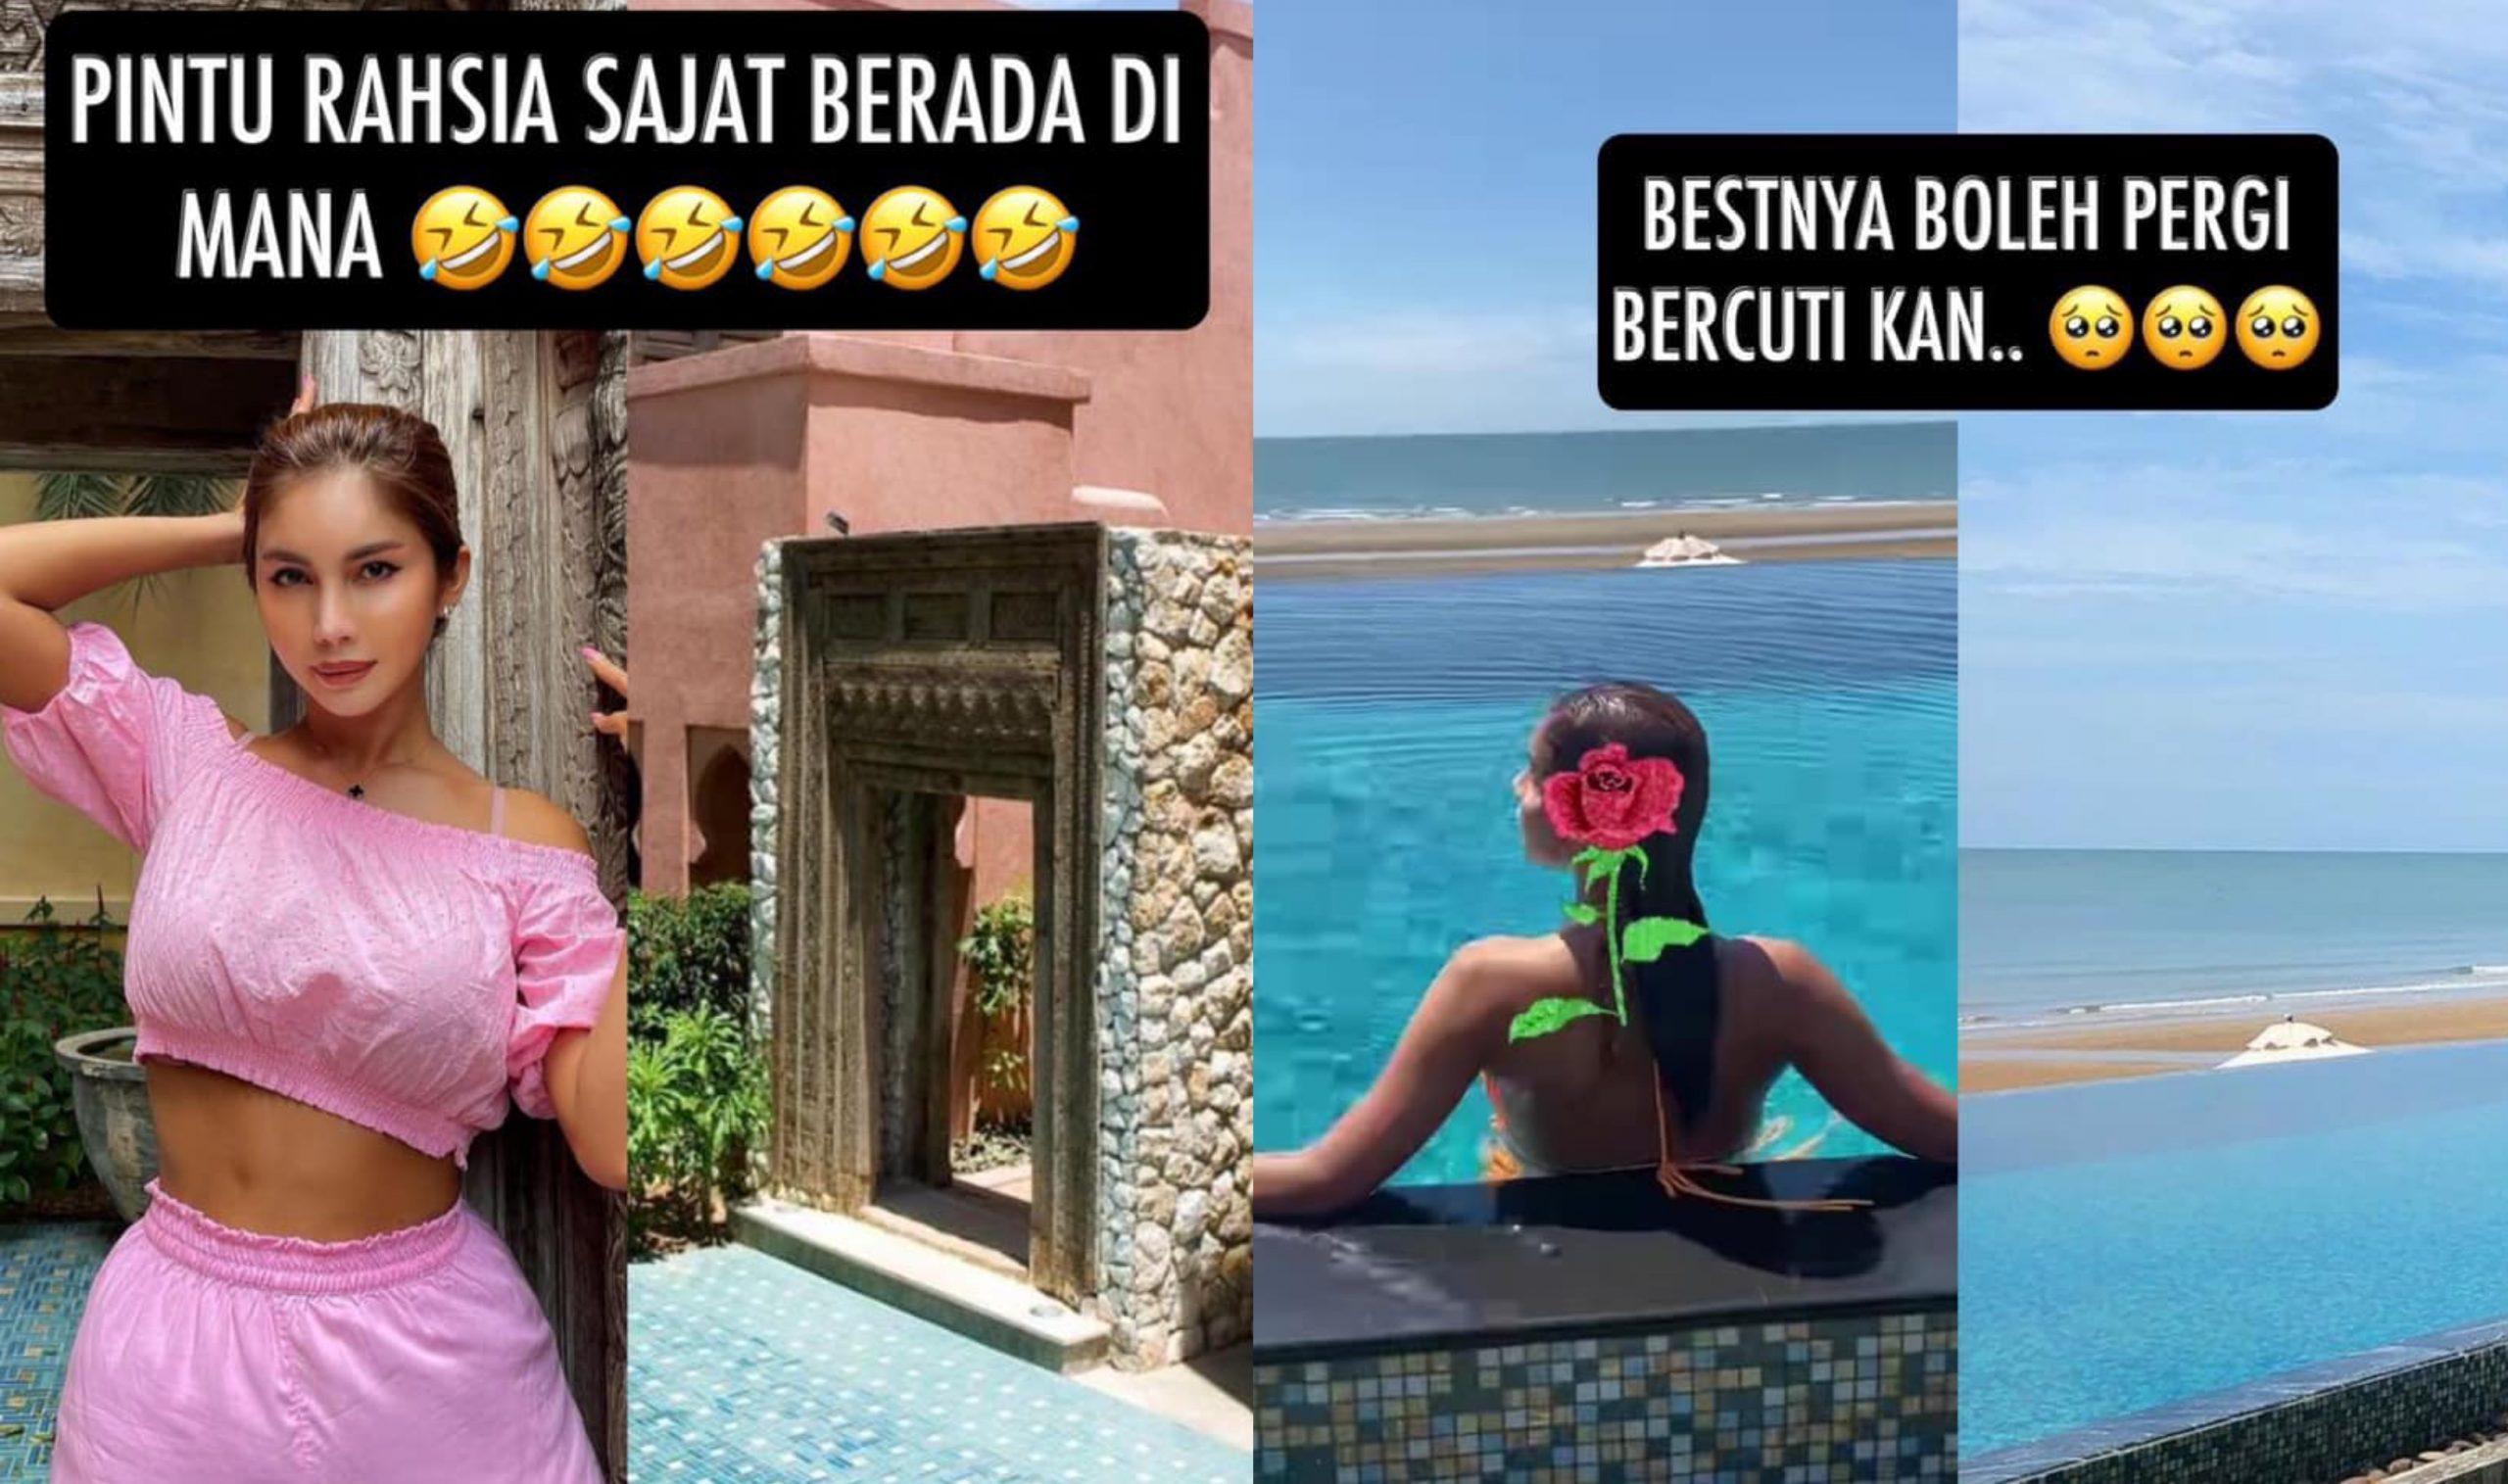 Kongsi Foto Tepi Pantai, Netizen Siasat Lokasi 'Rahsia' Sajat. Sebijik Macam Hotel Dekat… 6